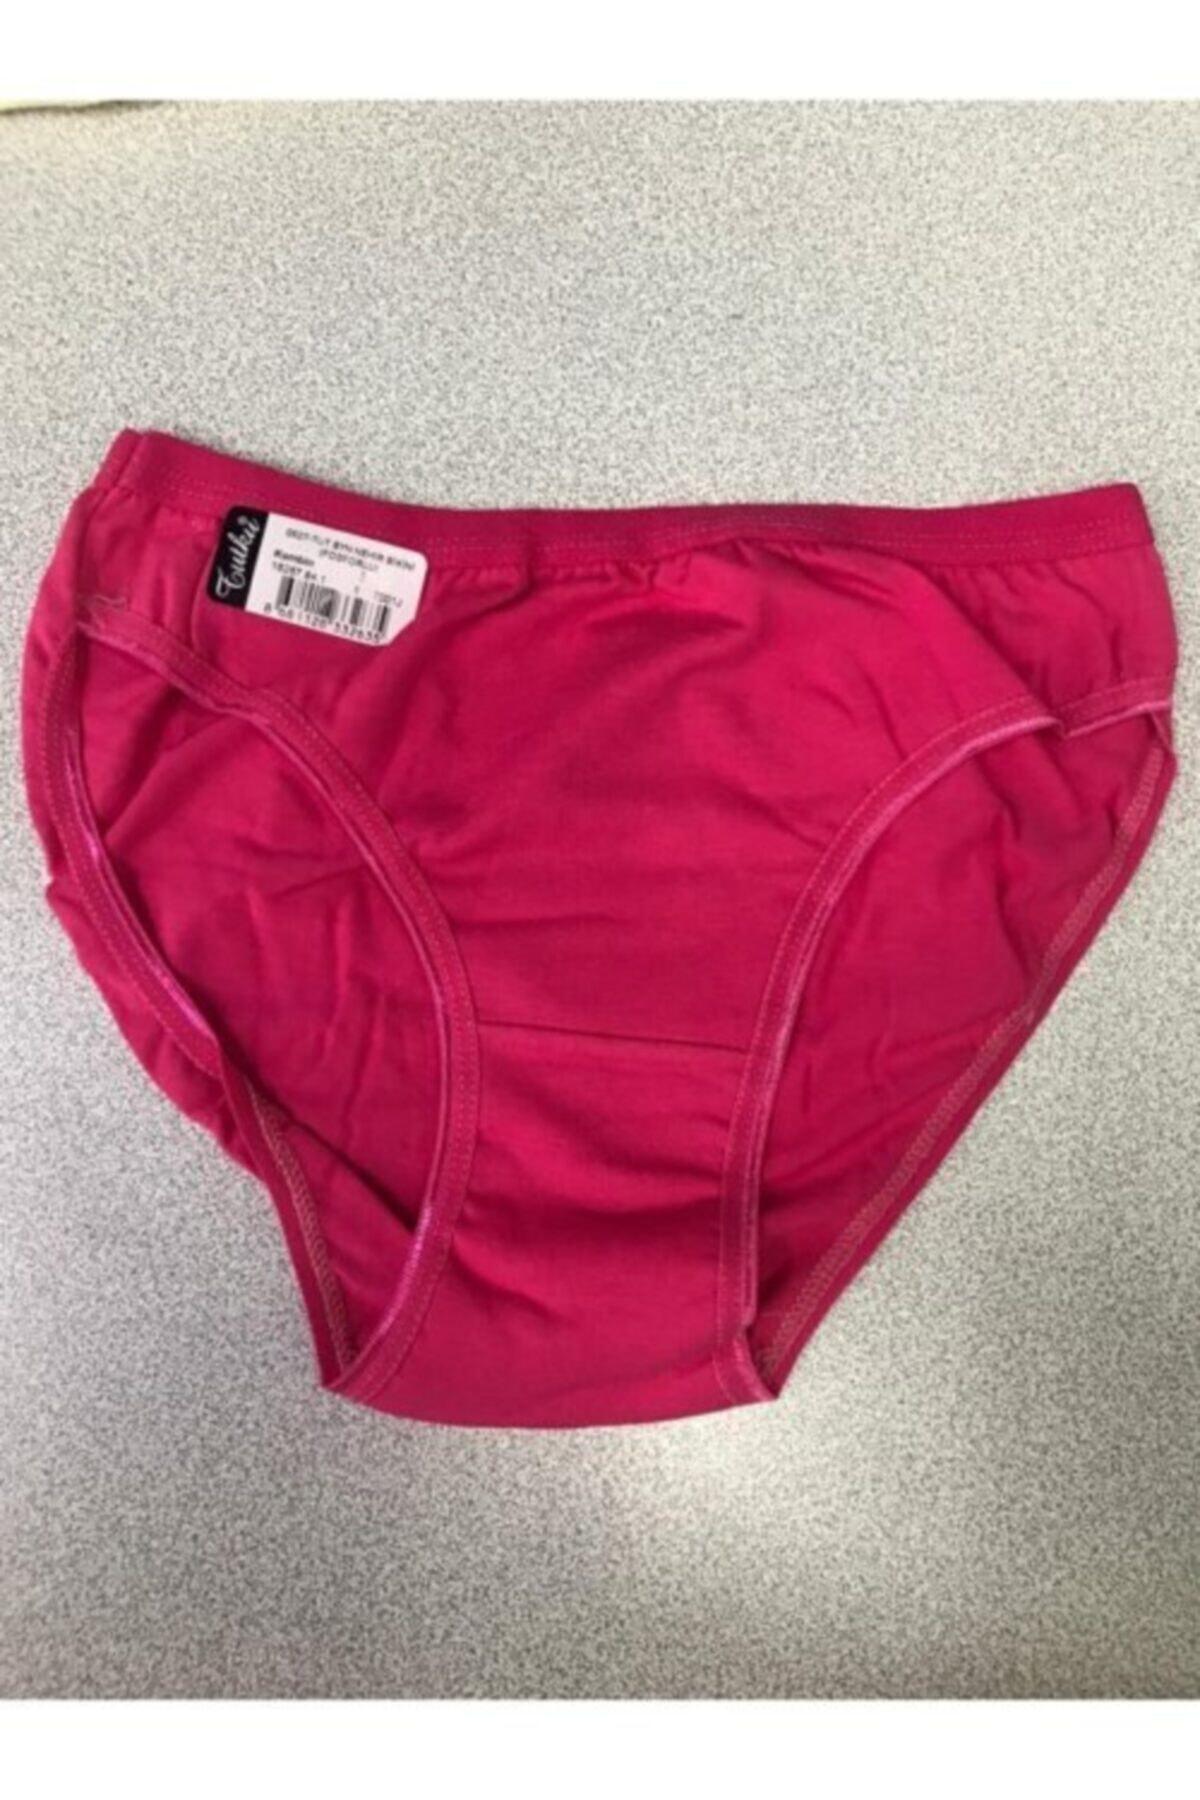 Tutku Kadın Pembe Nehir Bikini Külot 12'li Paket 2